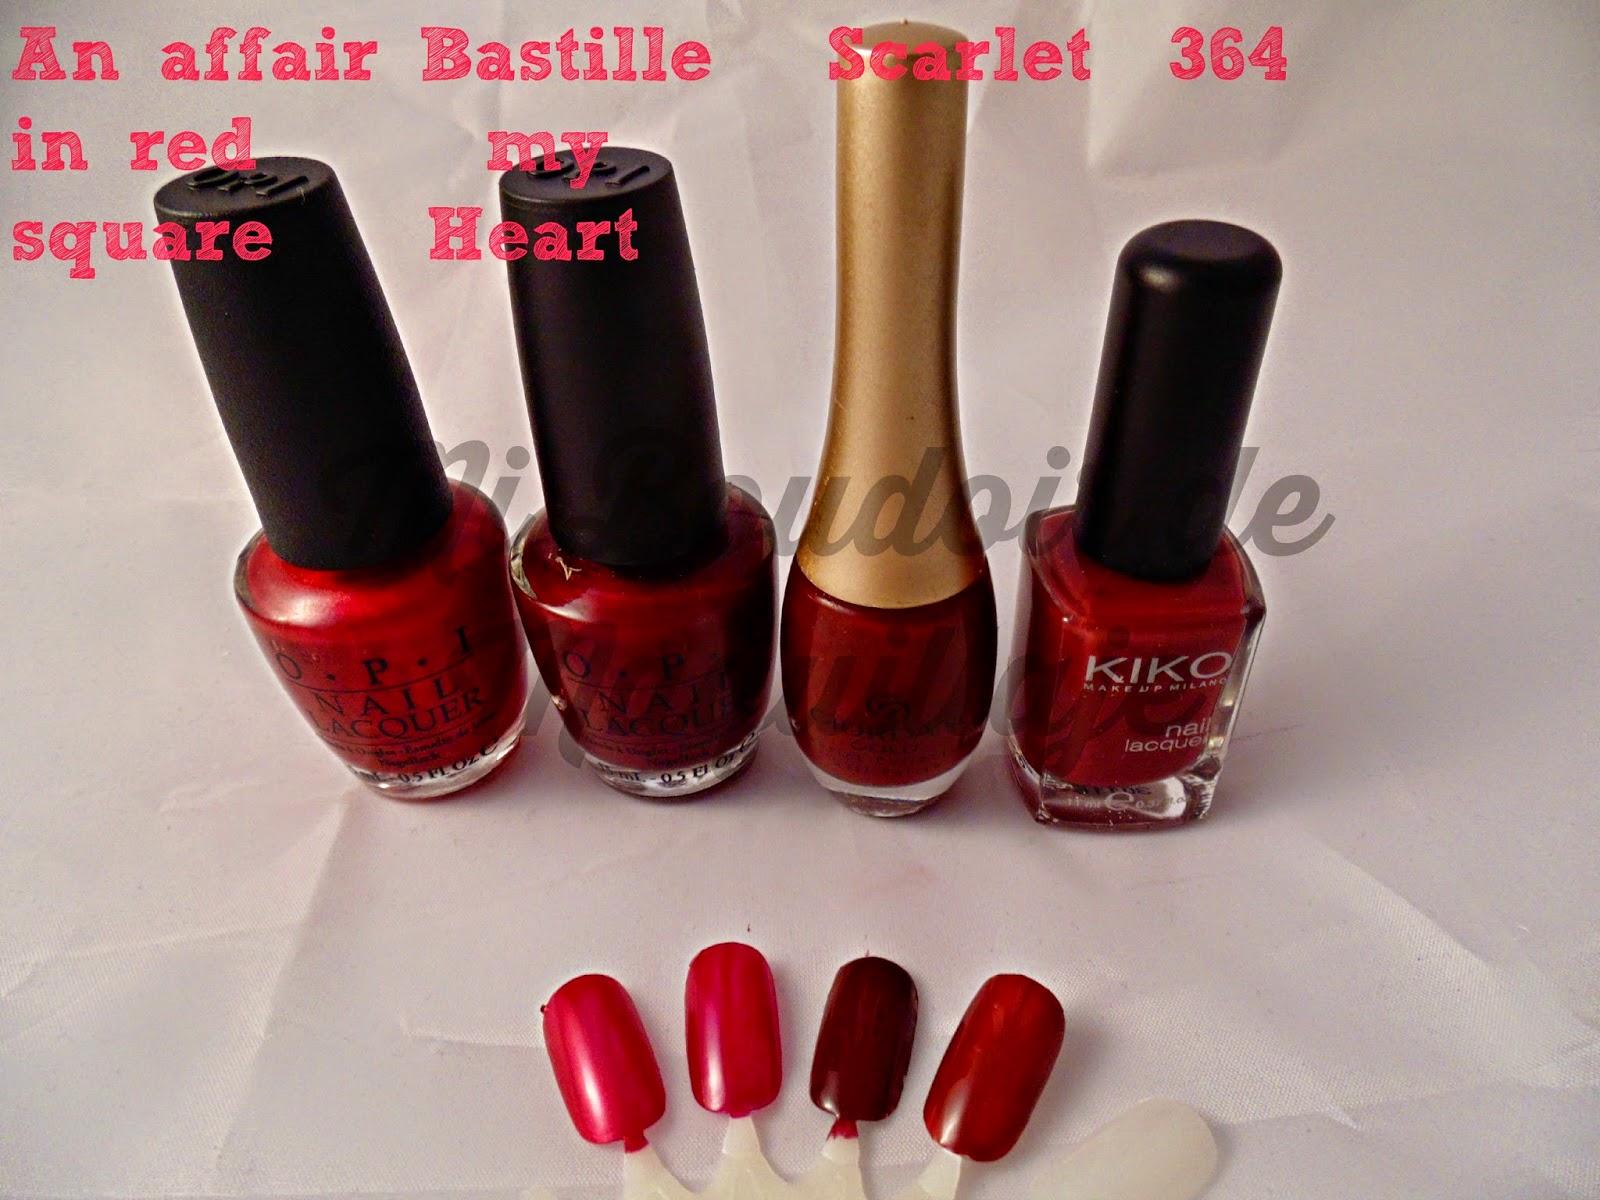 Opi Oriflame Kiko nails laca de uñas